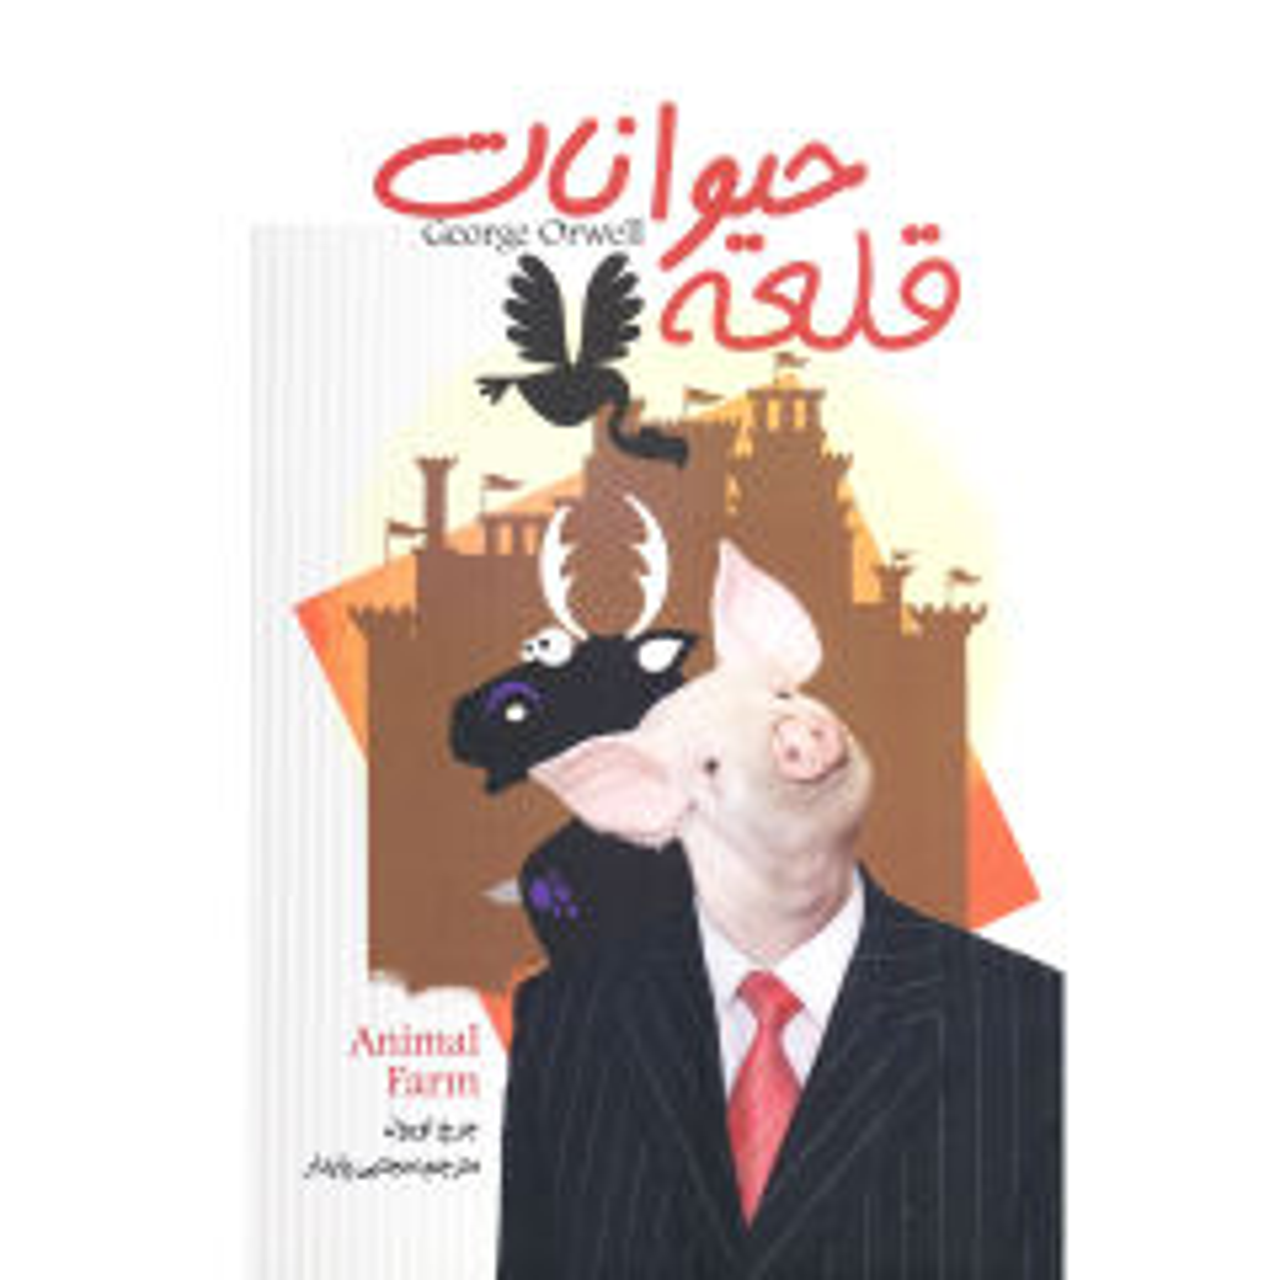 کتاب قلعه حیوانات اثر جورج اورول نشر سالار الموتی